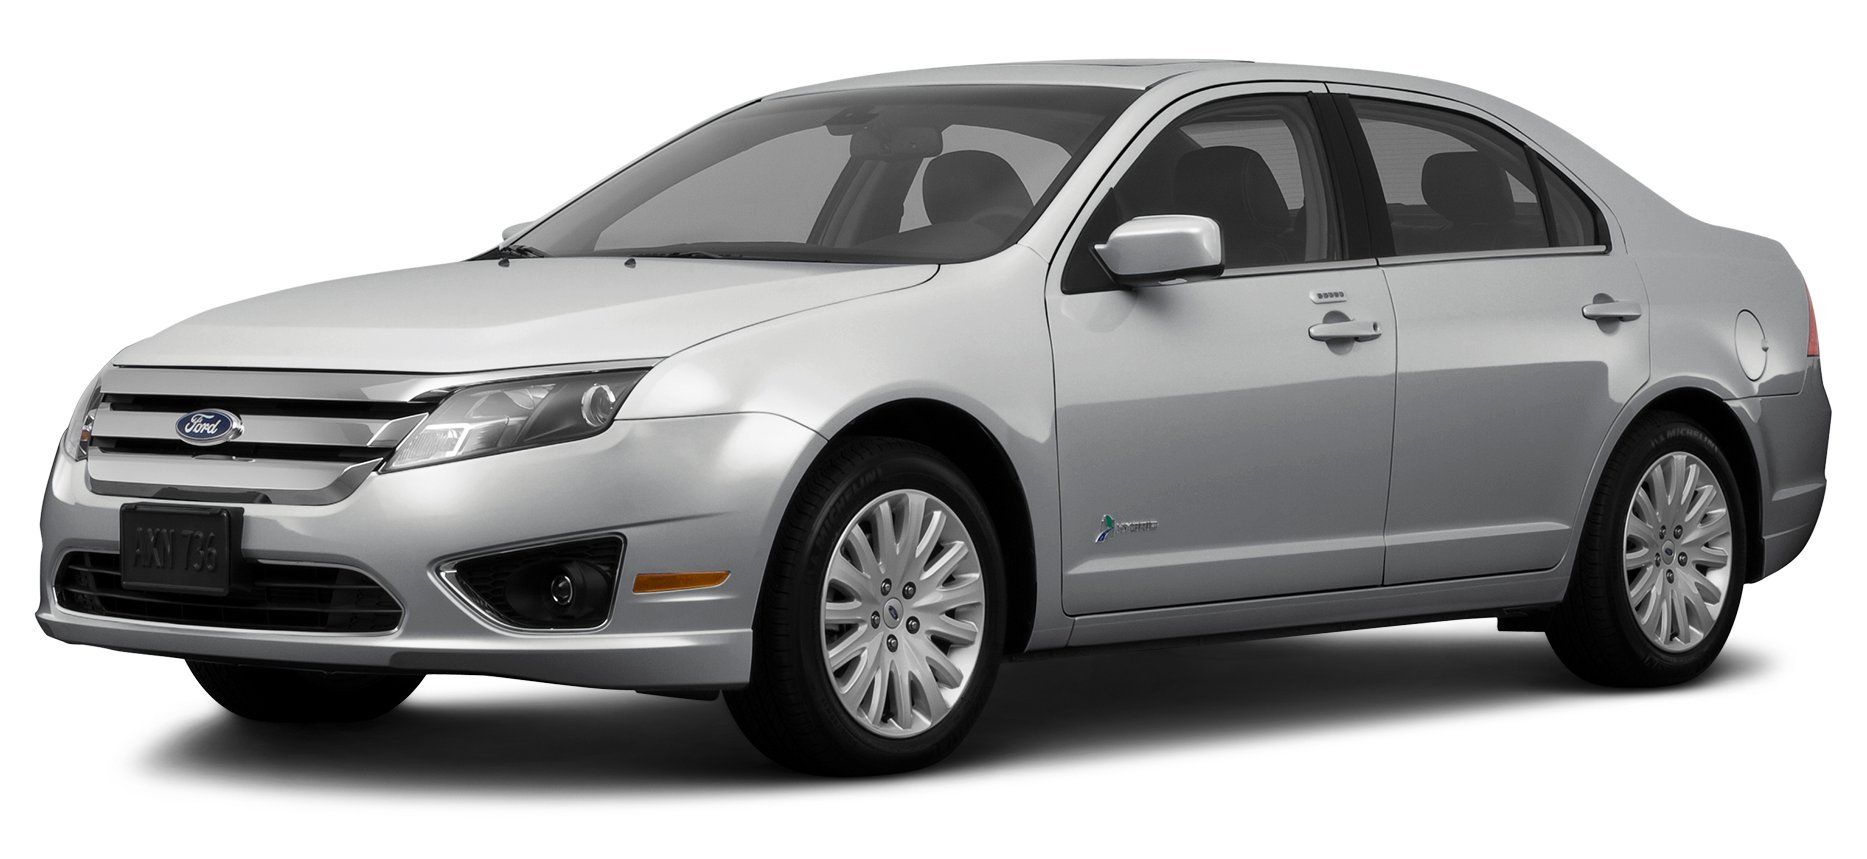 2011 ford fusion hybrid 4 door sedan front wheel drive